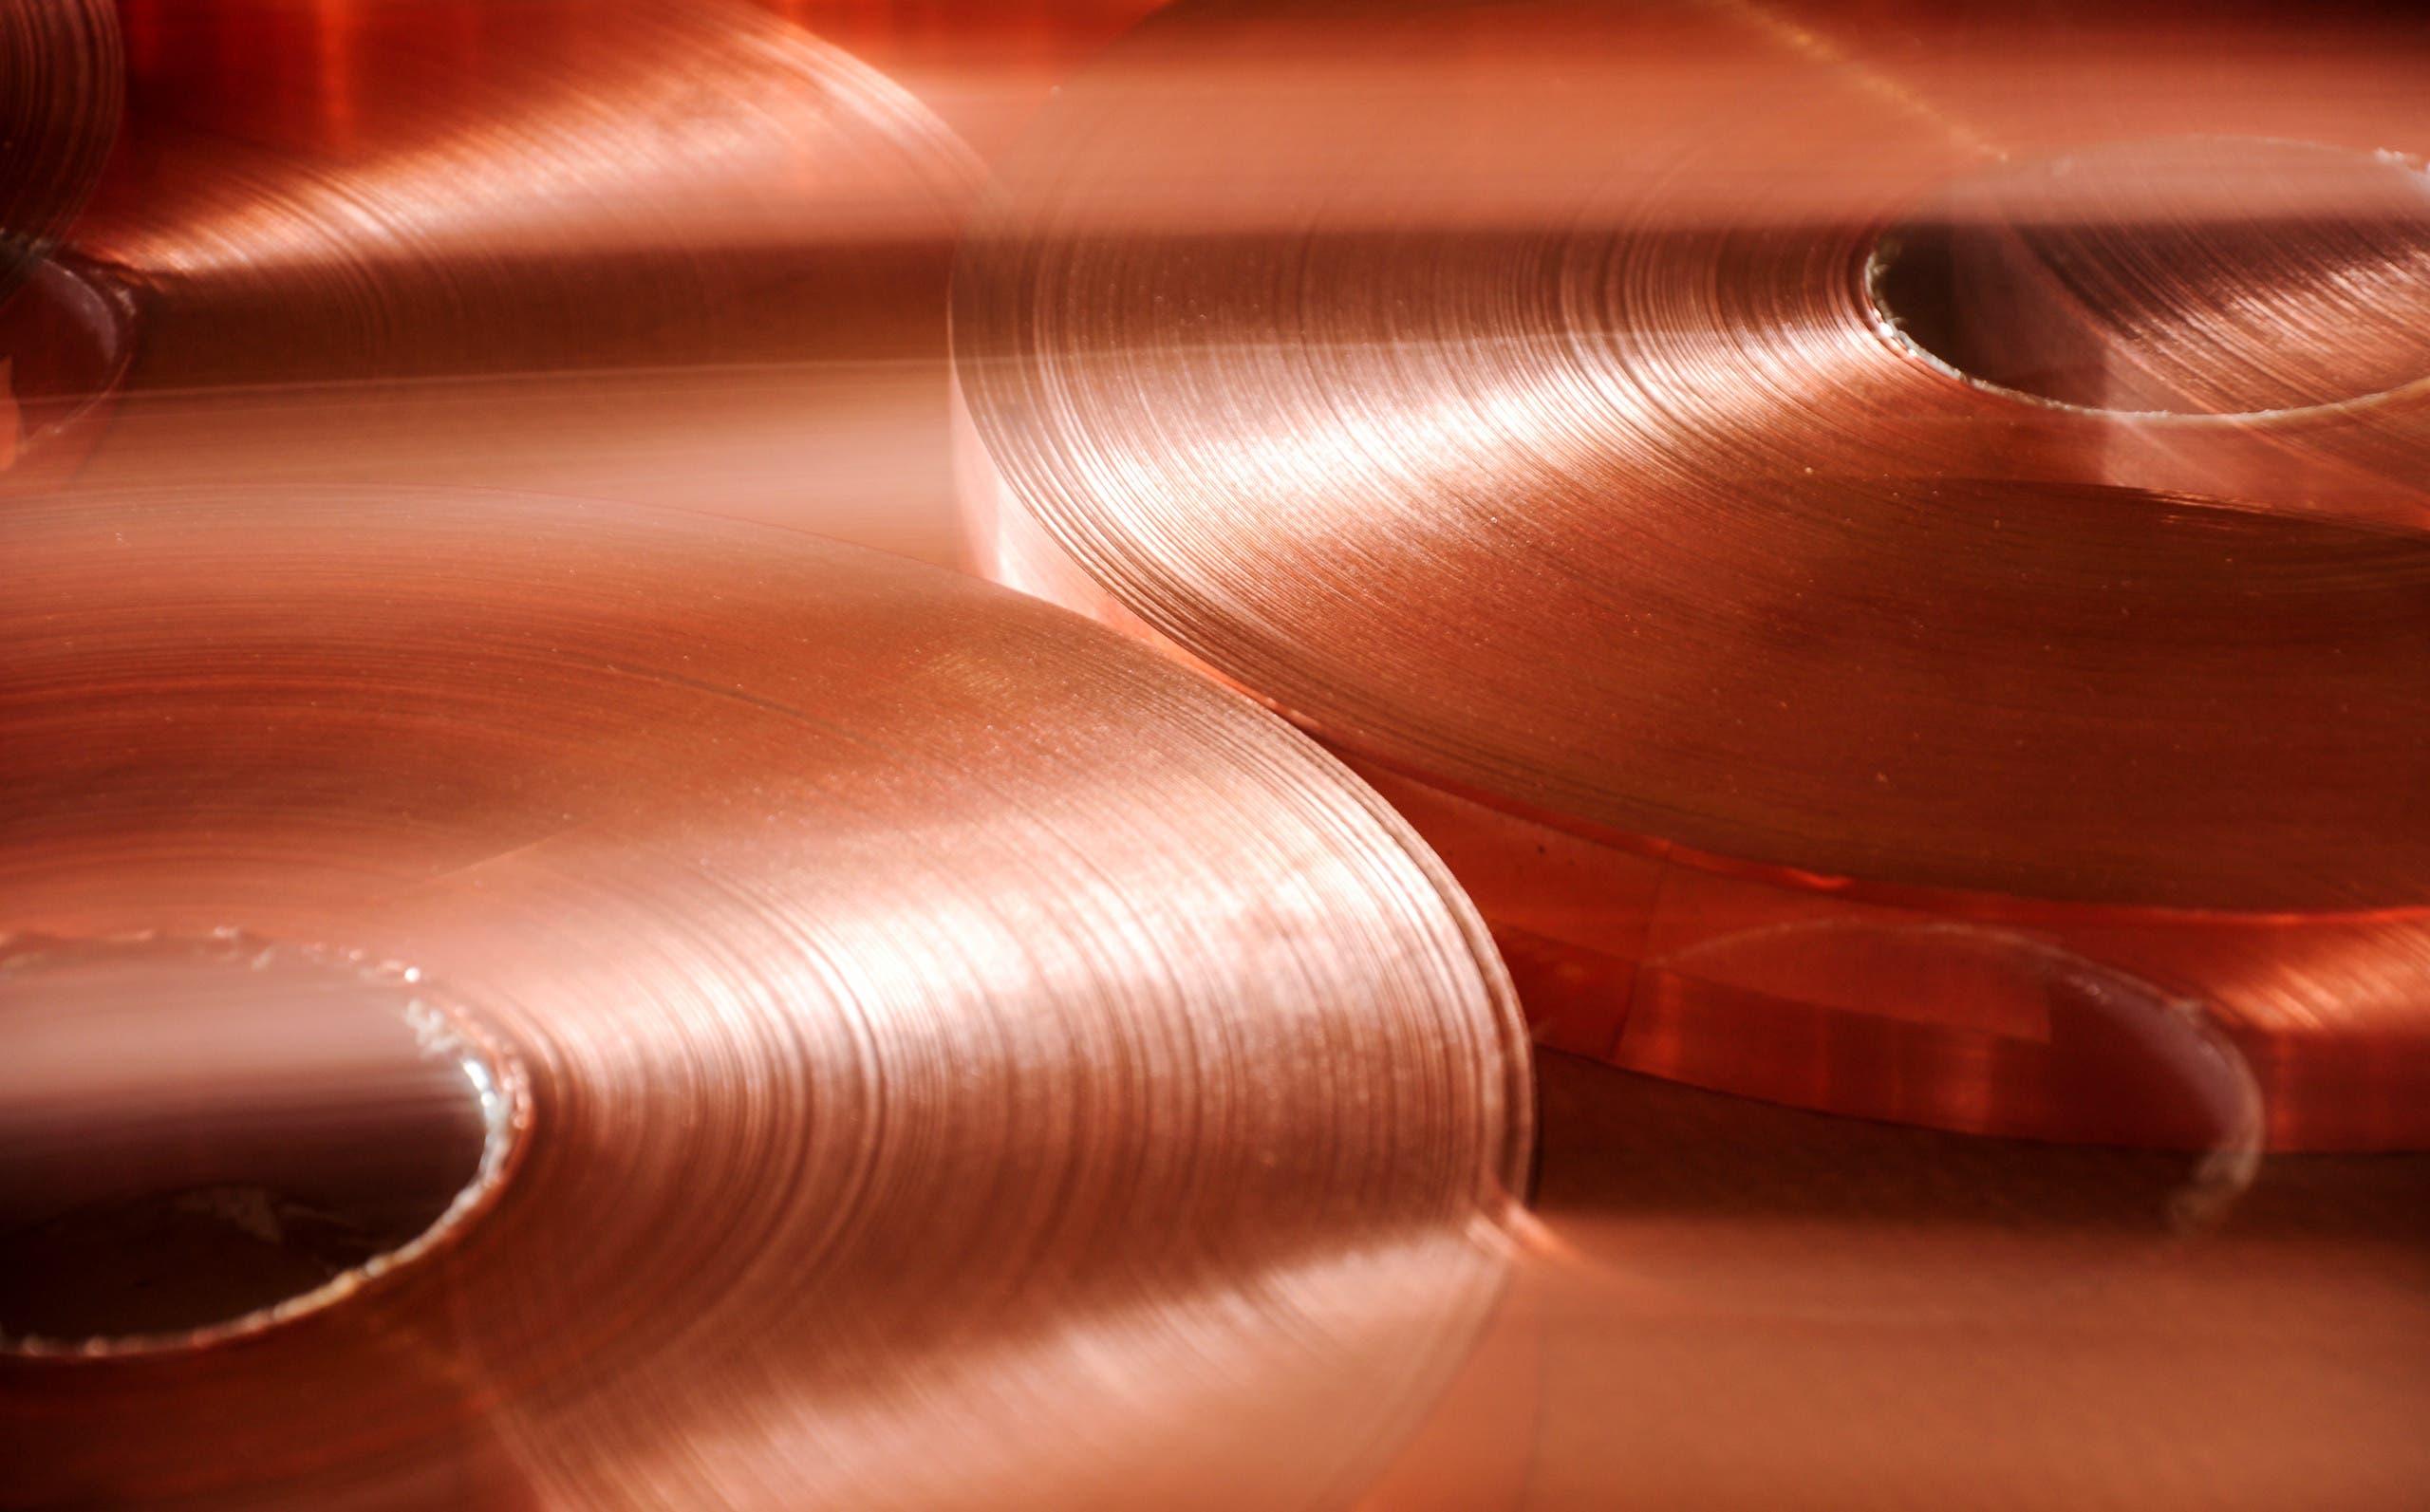 A stock image of copper. (File photo)